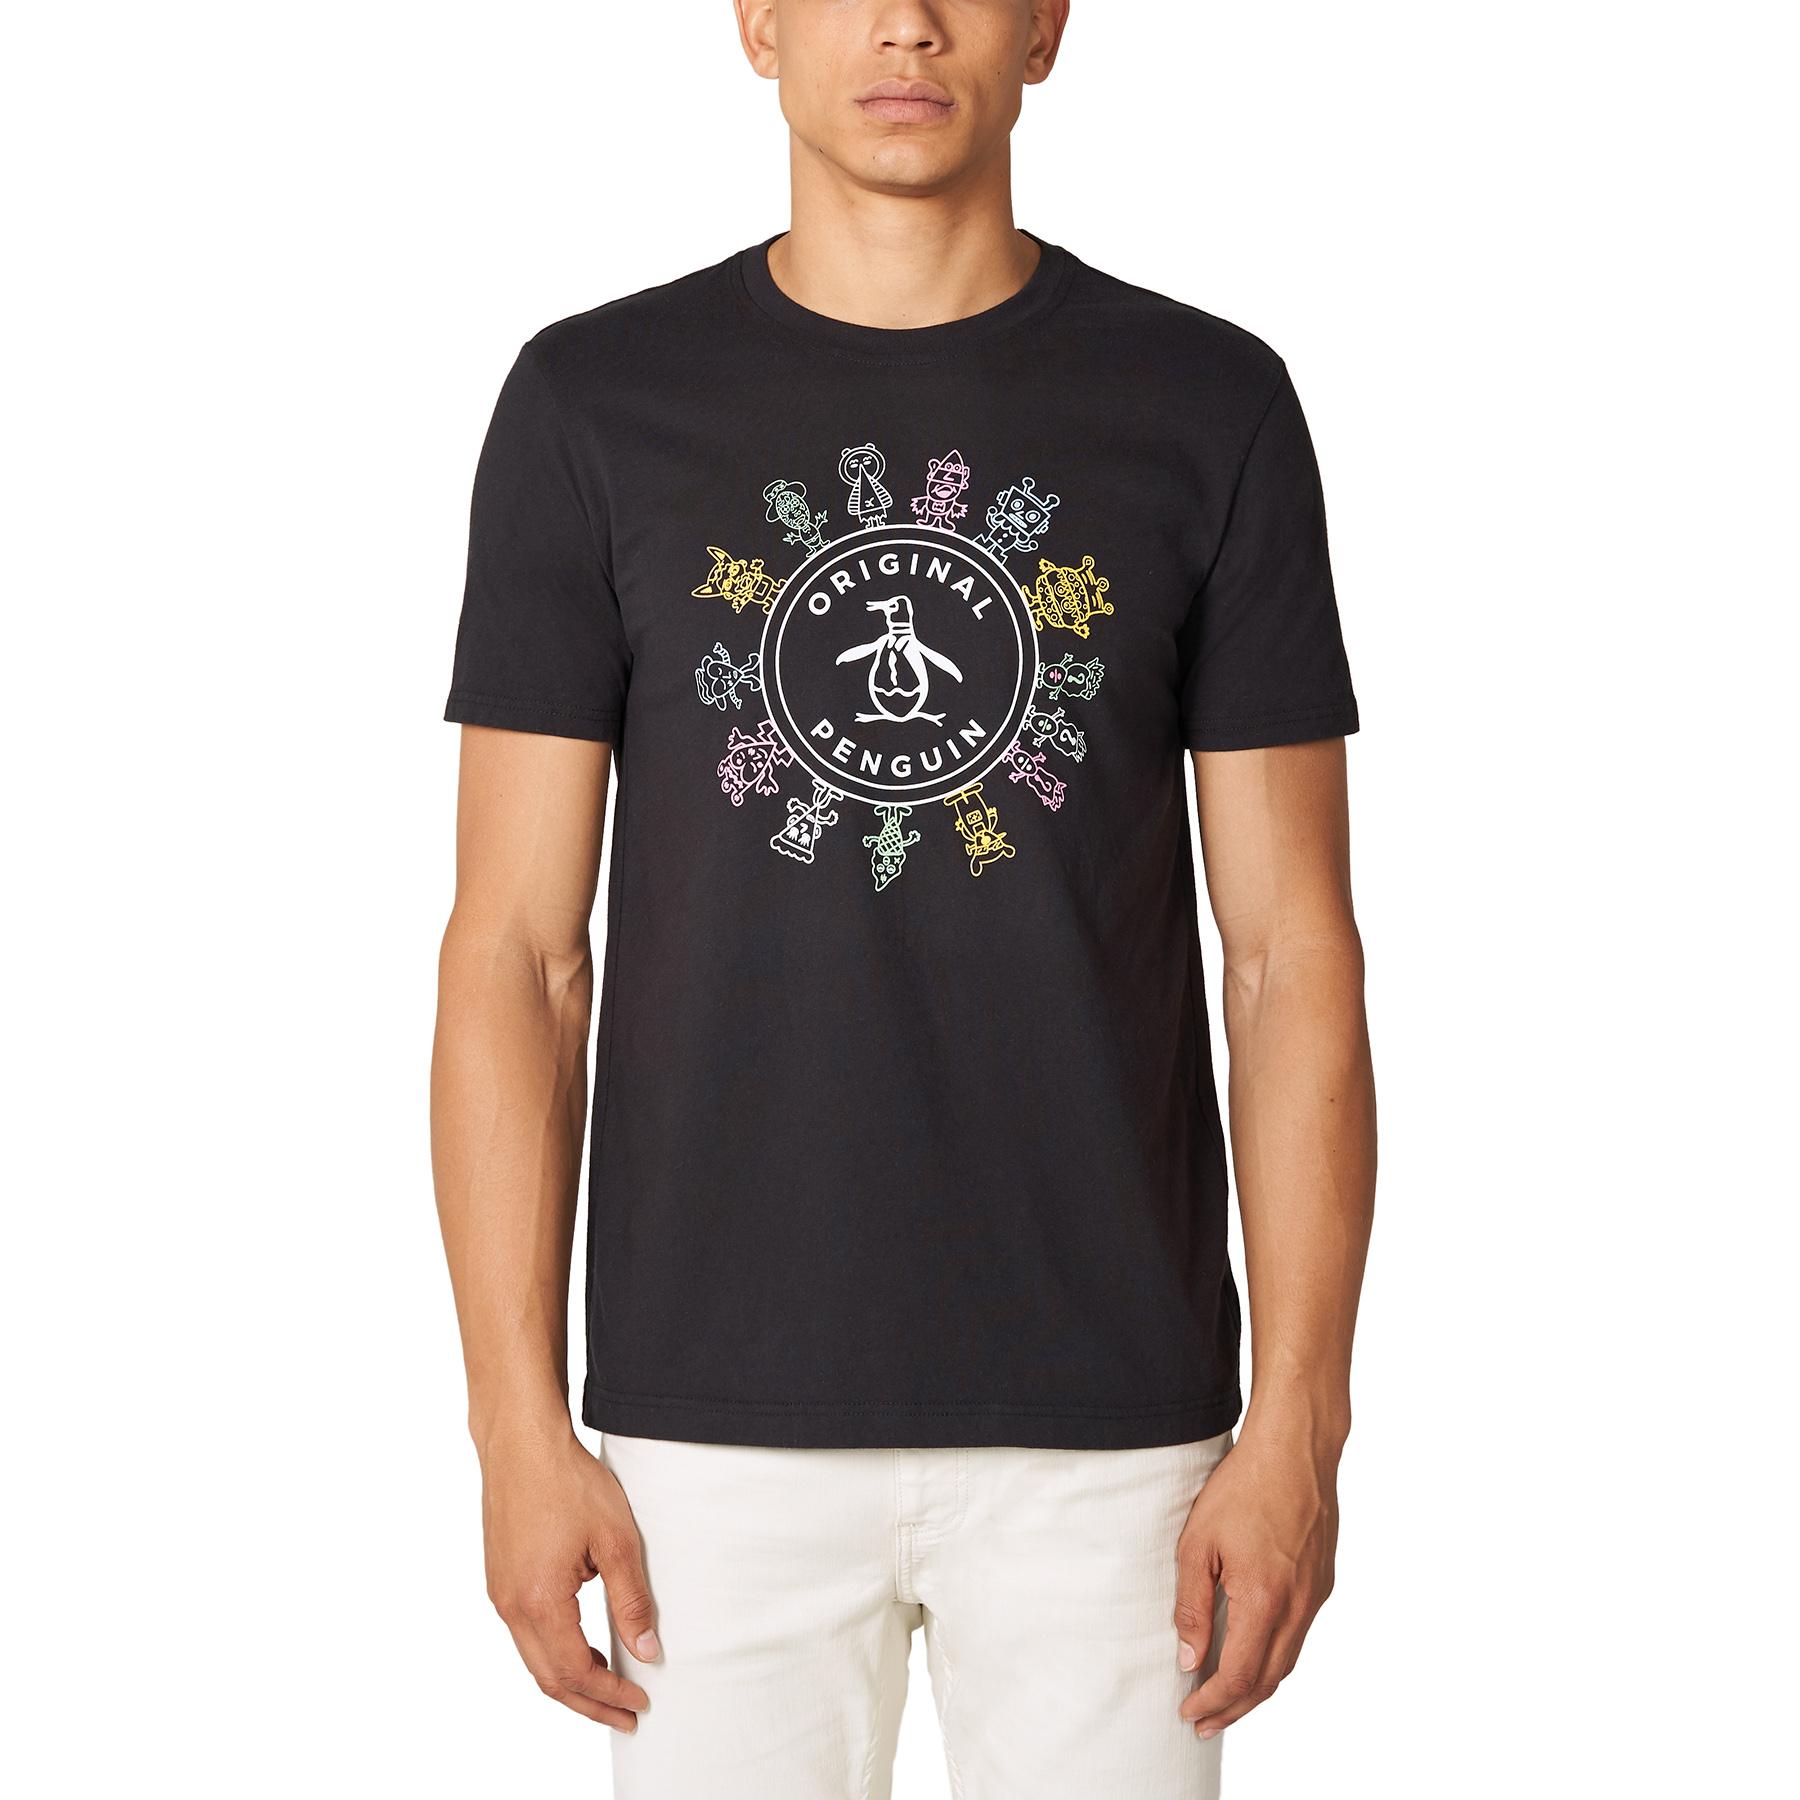 The Original Penguin T-shirts for Art Basel.